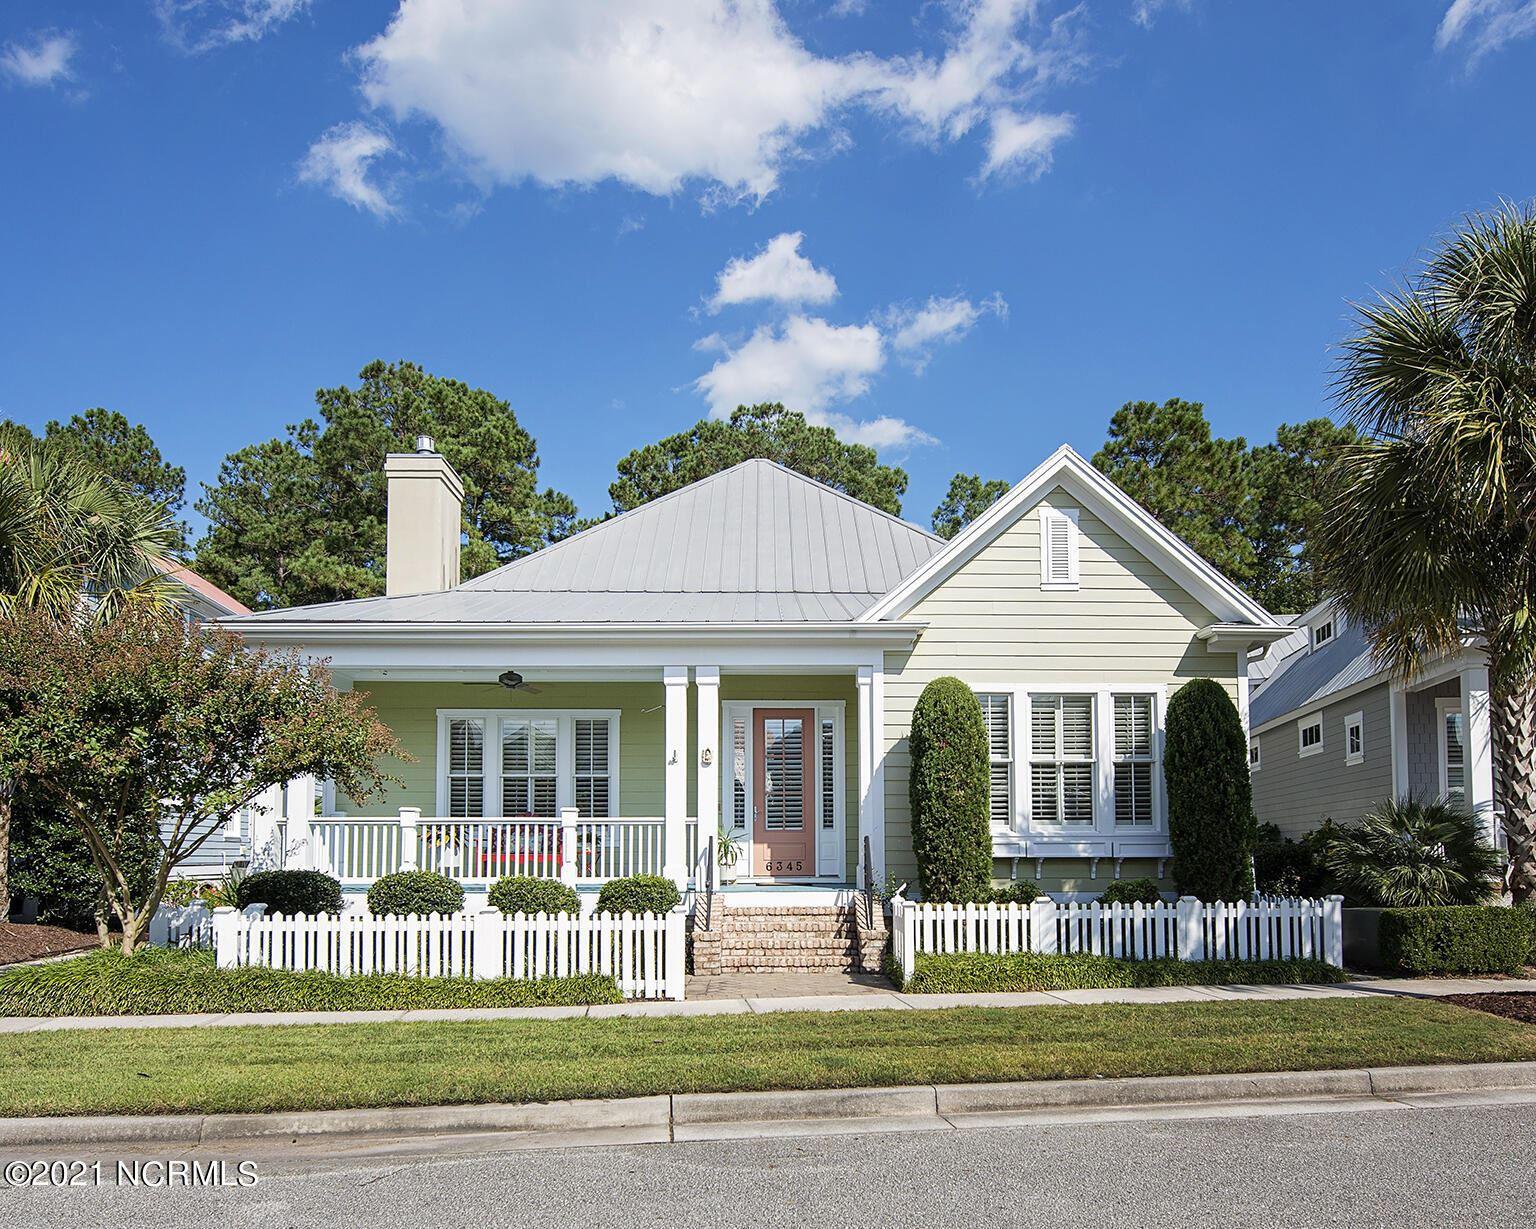 Photo of 6345 Chalfont Circle, Wilmington, NC 28405 (MLS # 100295663)